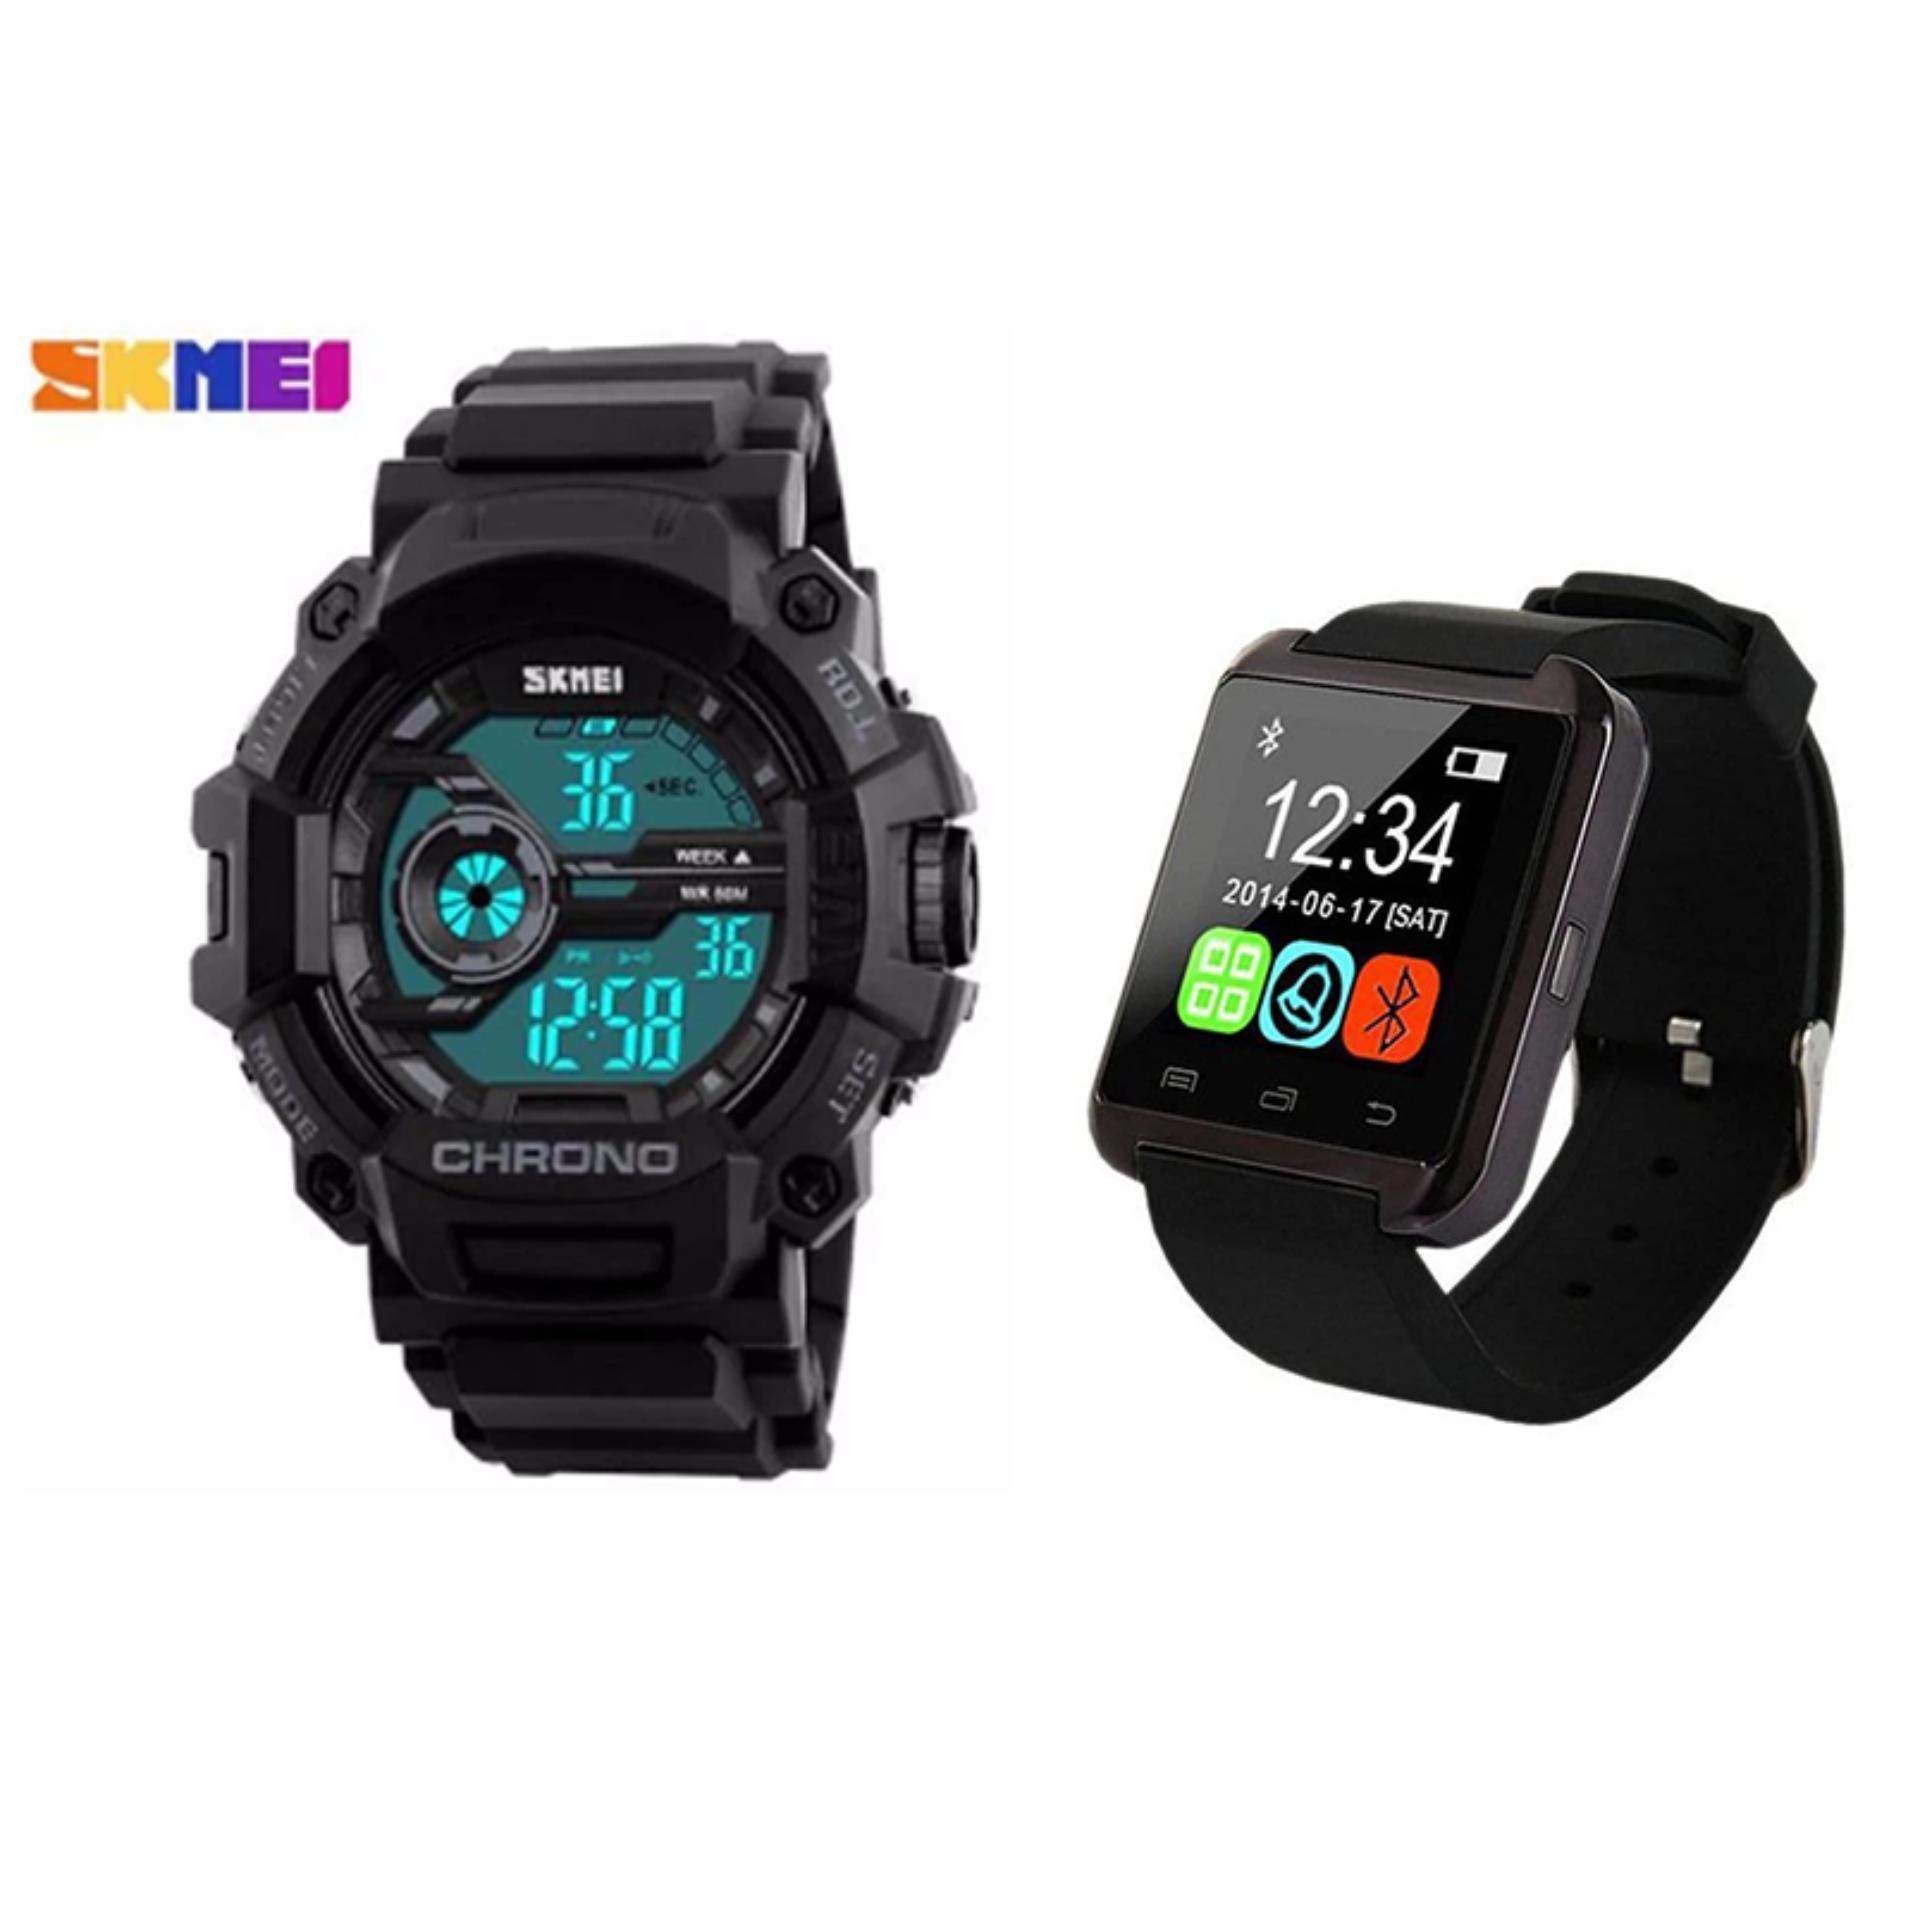 SKMEI 1233 Men Sports Digital Quartz Watch Water Resistant (Black) With M8 Bluetooth V3